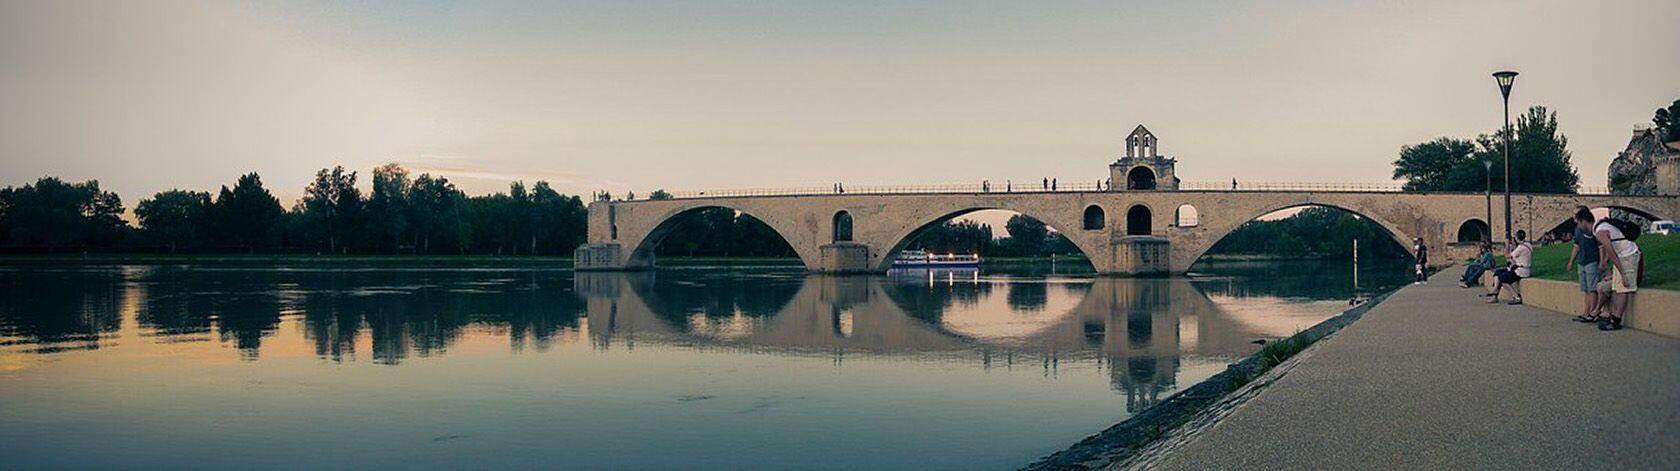 Pont d'Avignon Rhône River Pixabay